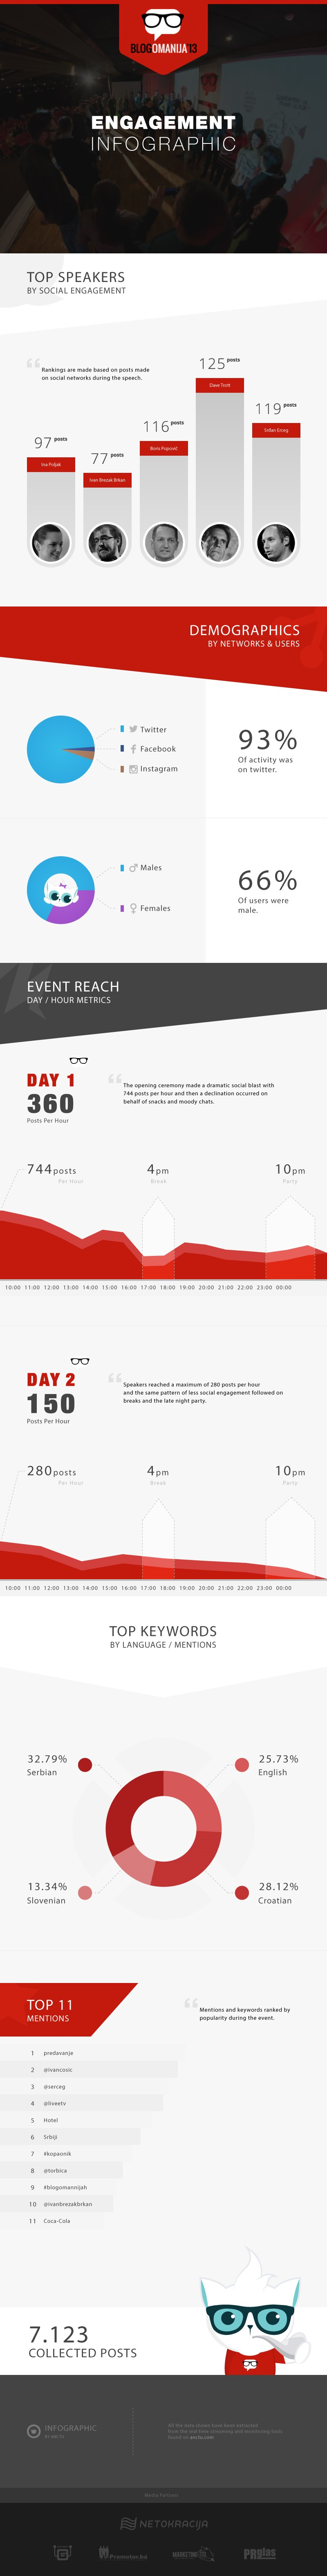 blogomanija infografik anctu